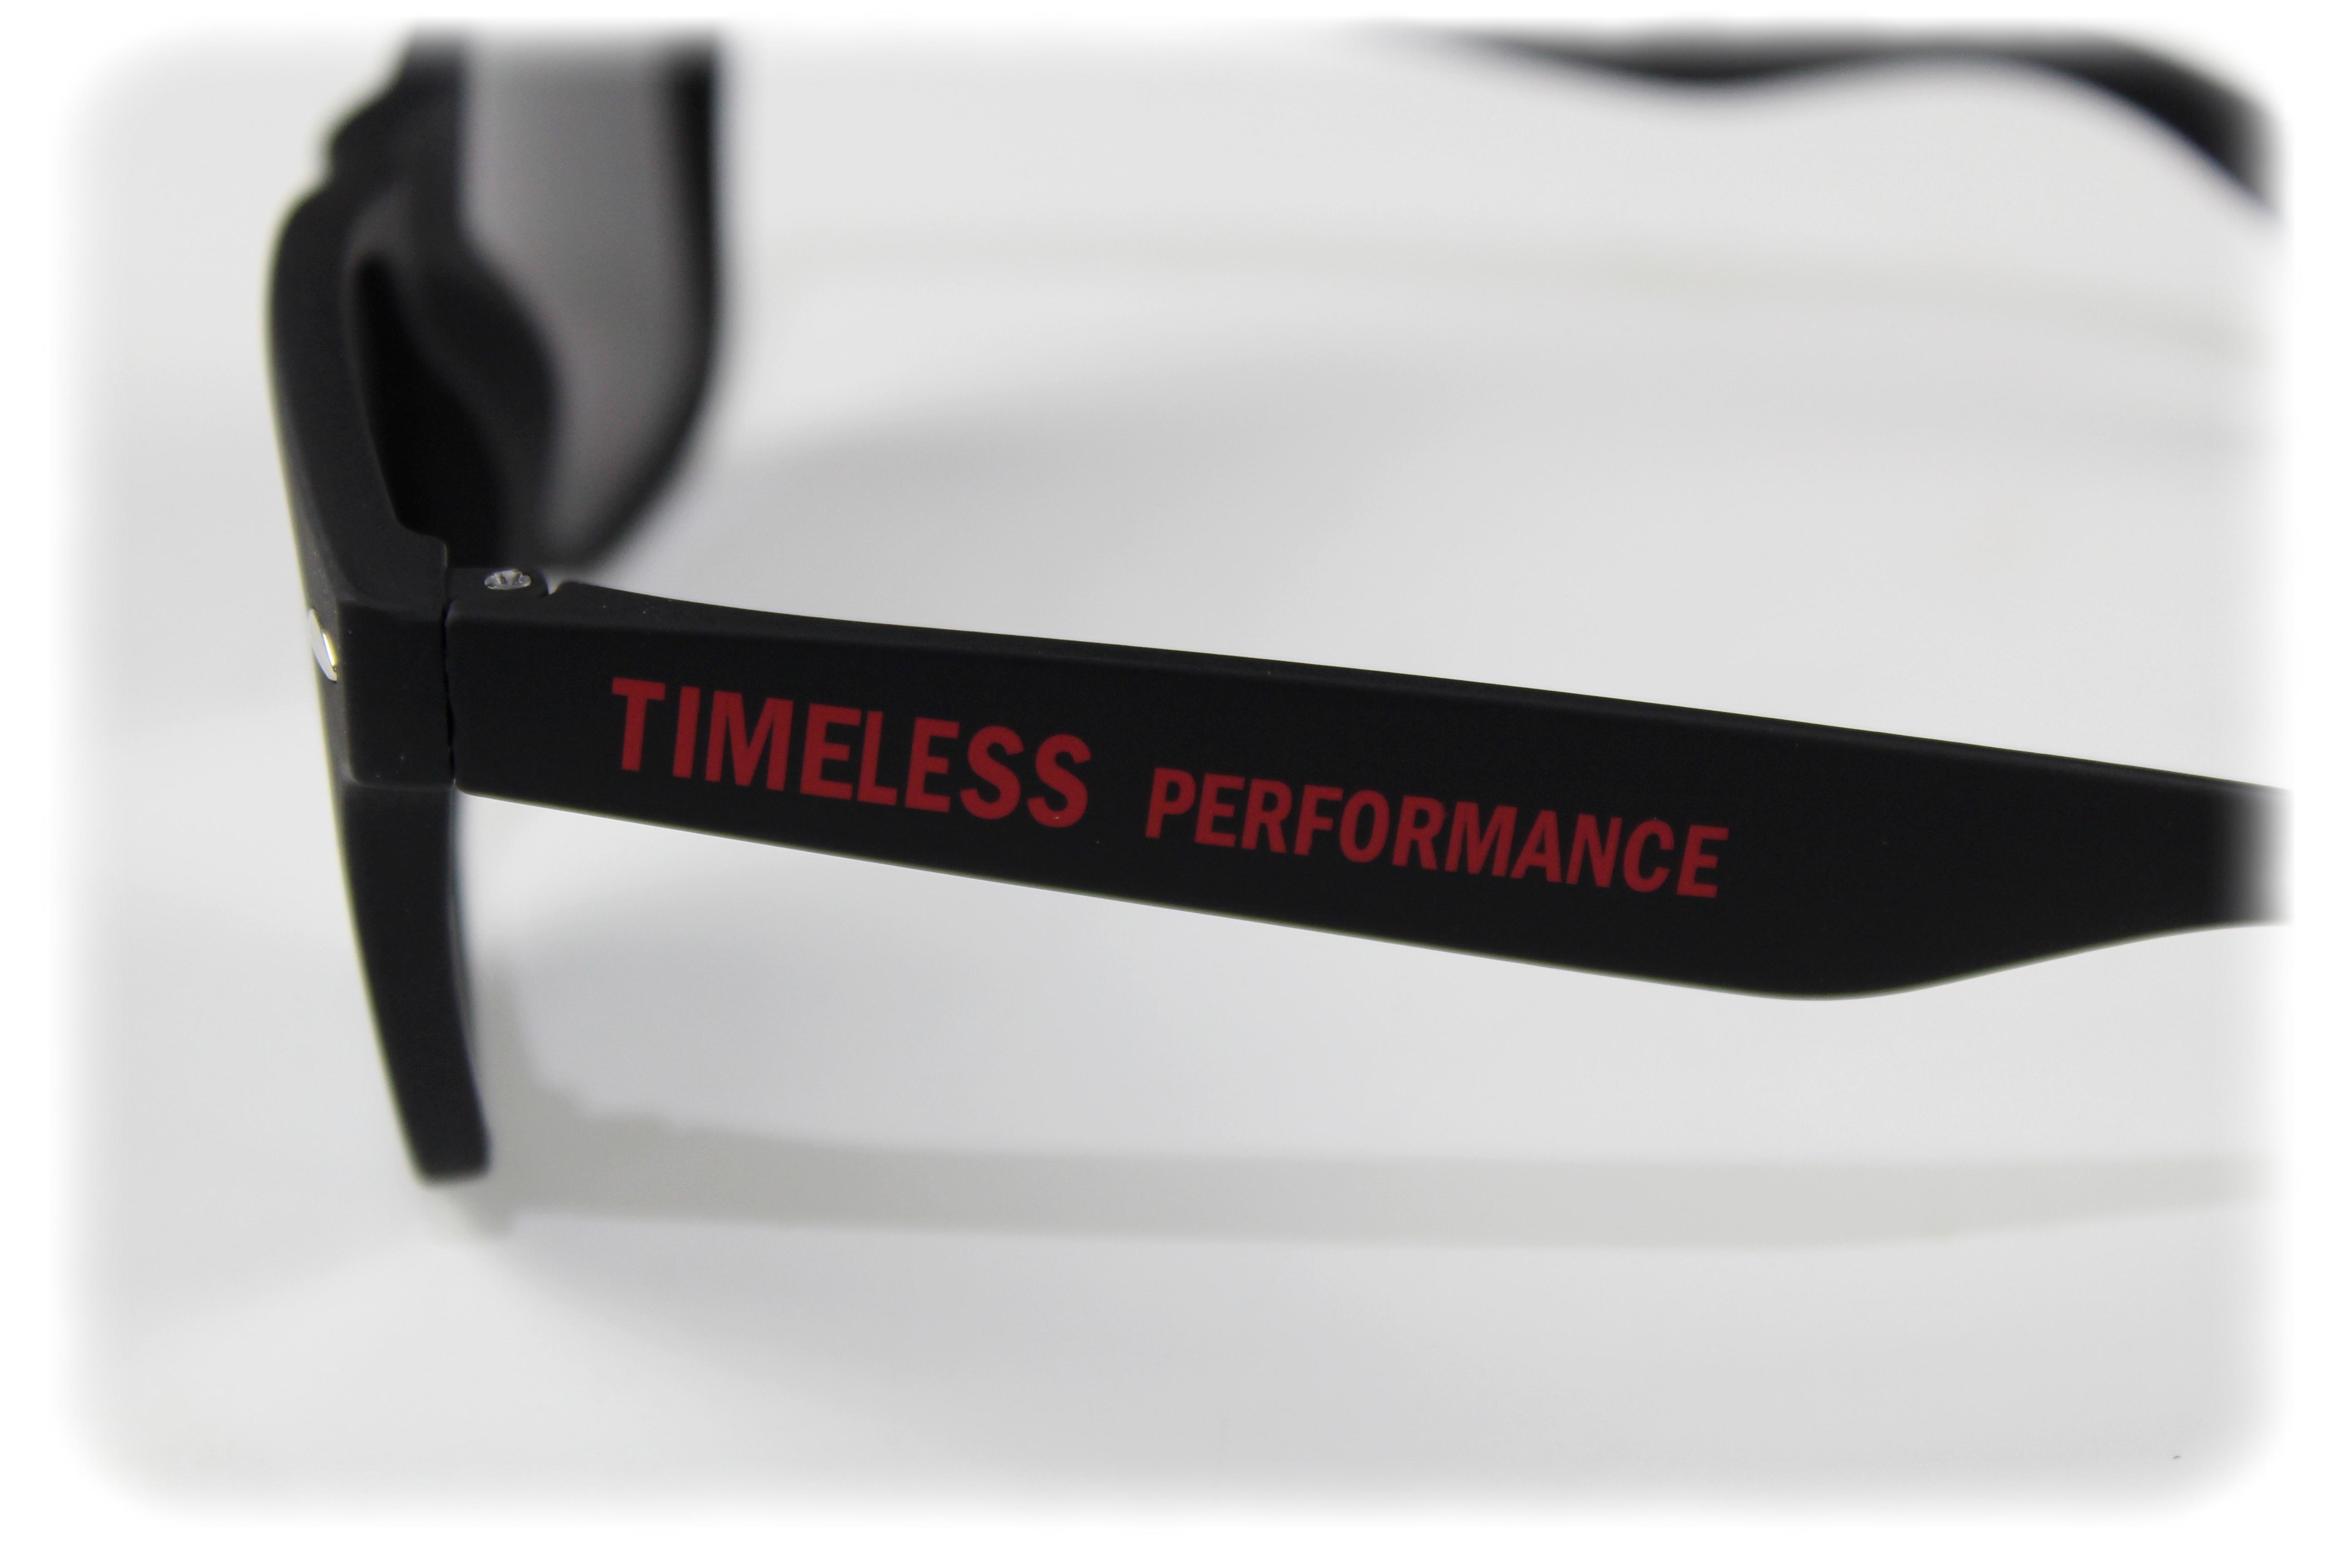 ORIGINALE VOLKSWAGEN GTI Occhiali da sole-Timeless performance 5ka087900